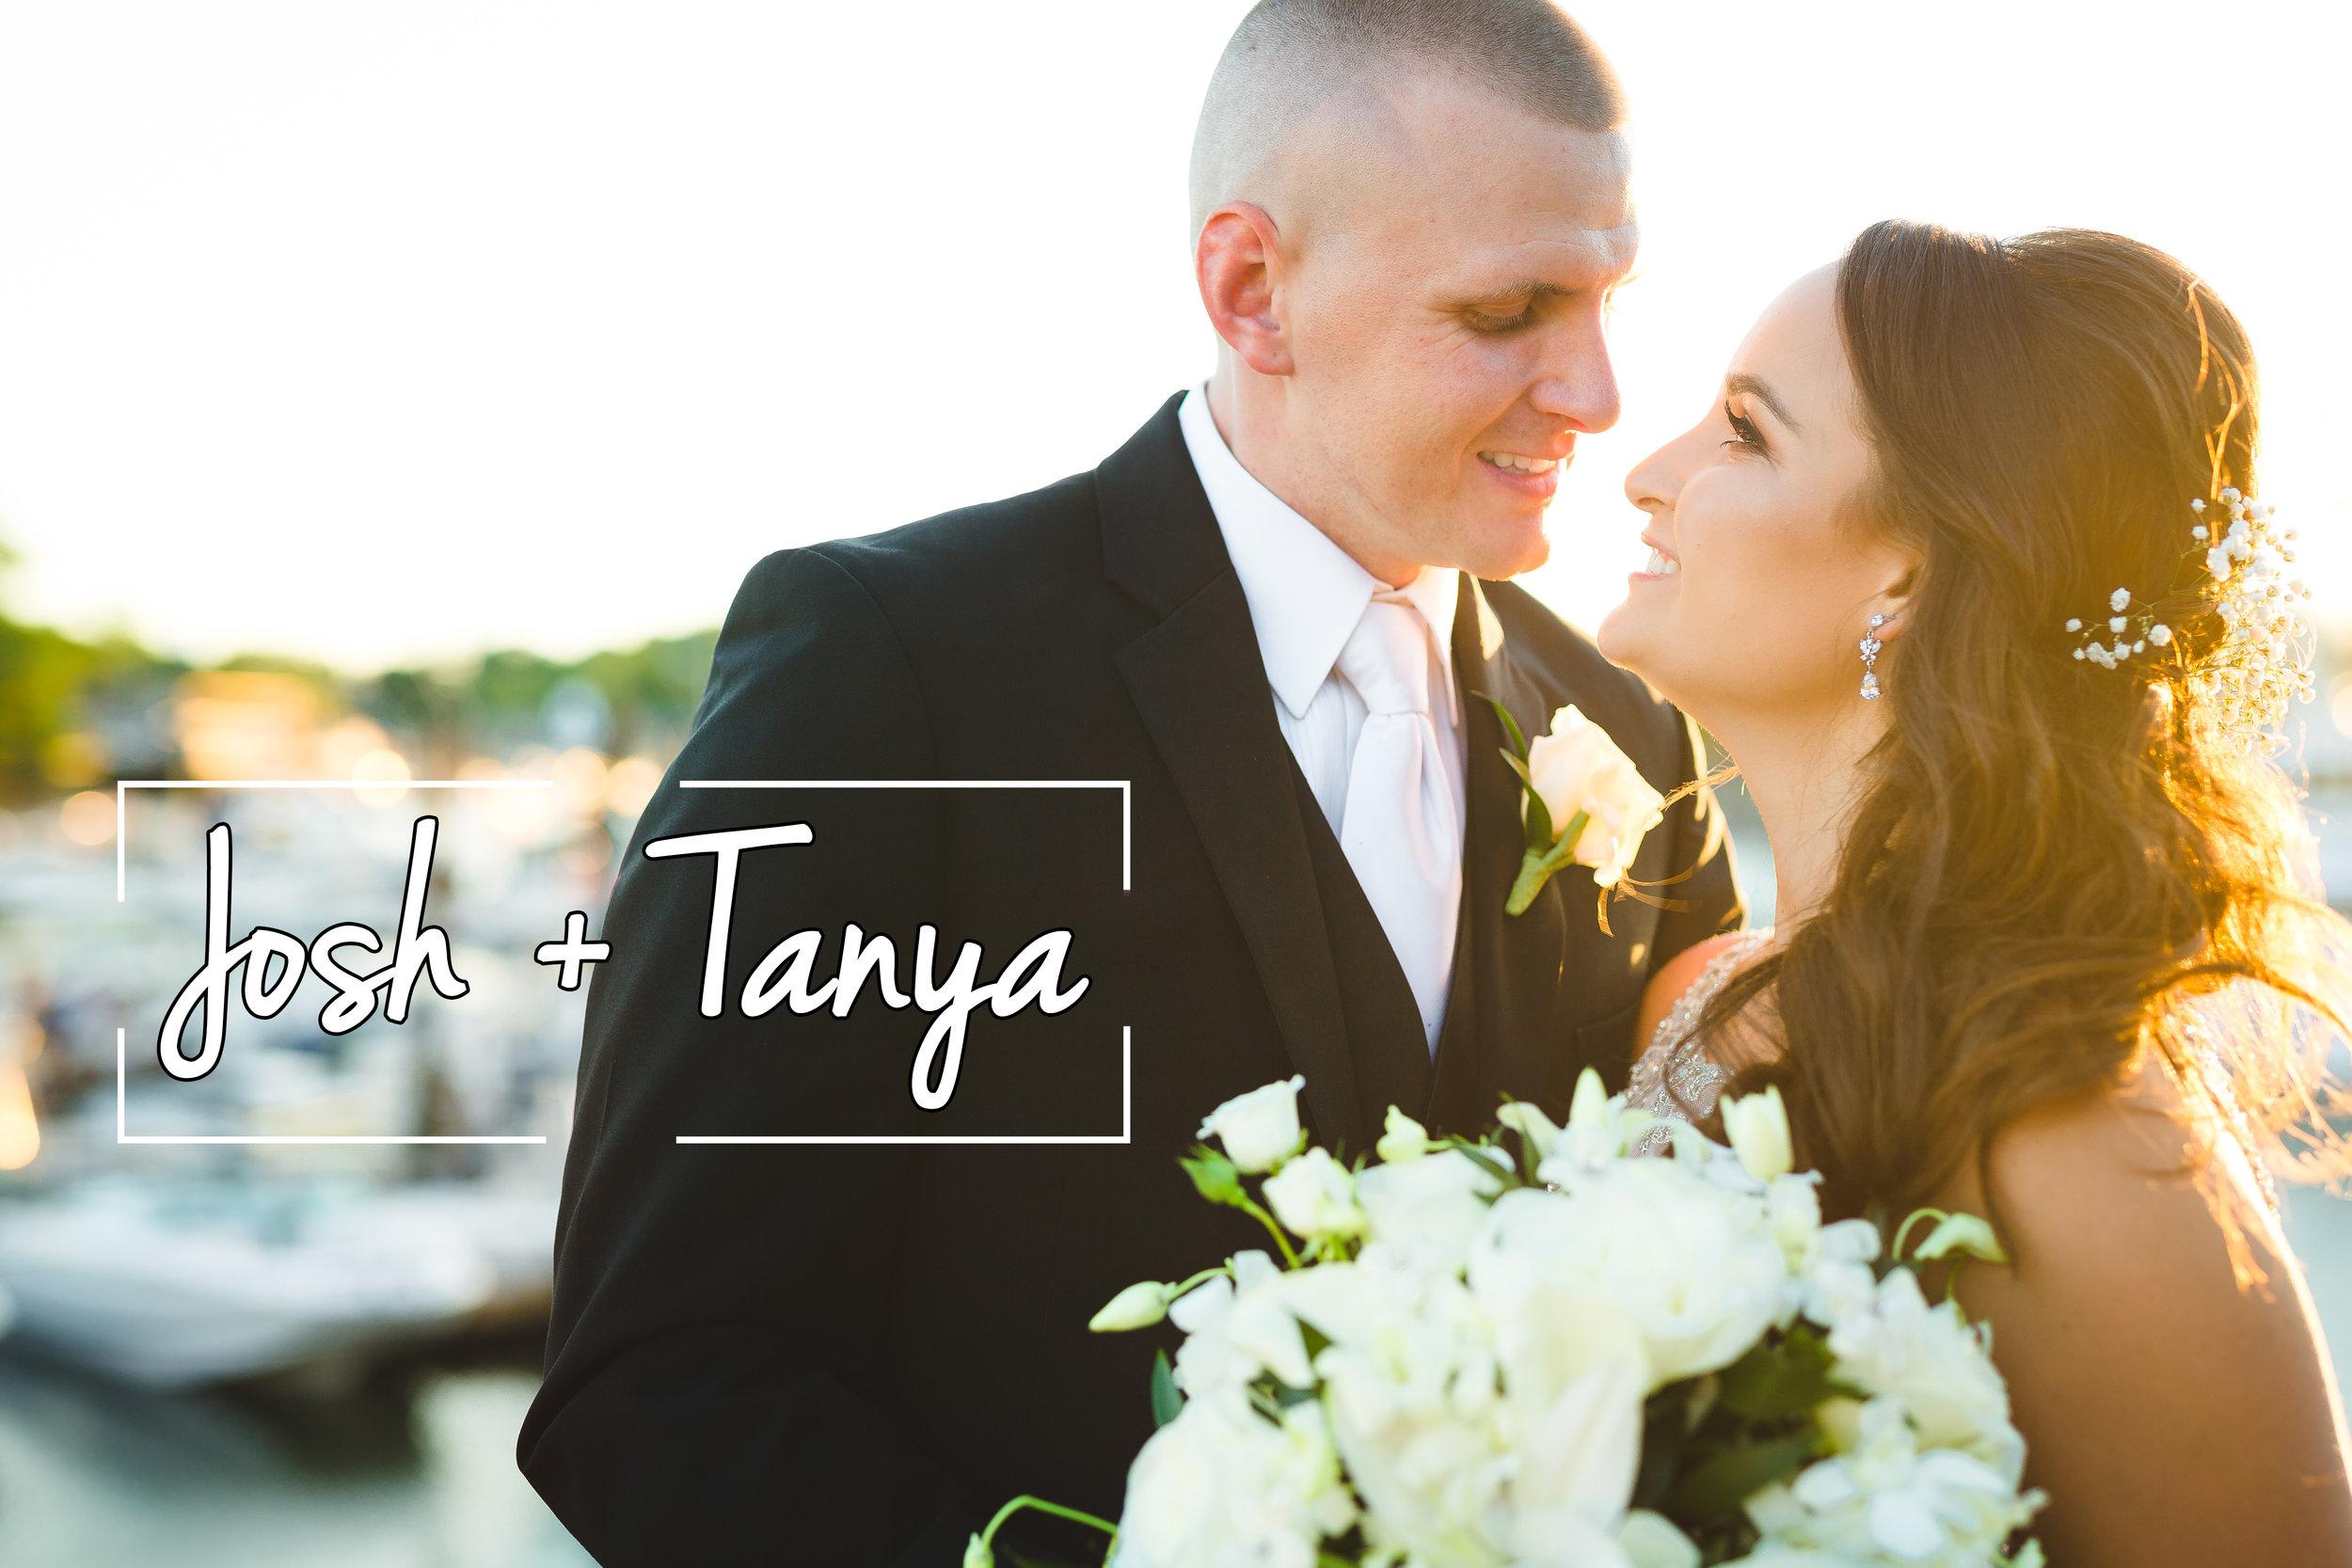 984-Josh&Tanya_couplessesh-2E6A8779 copy.jpg